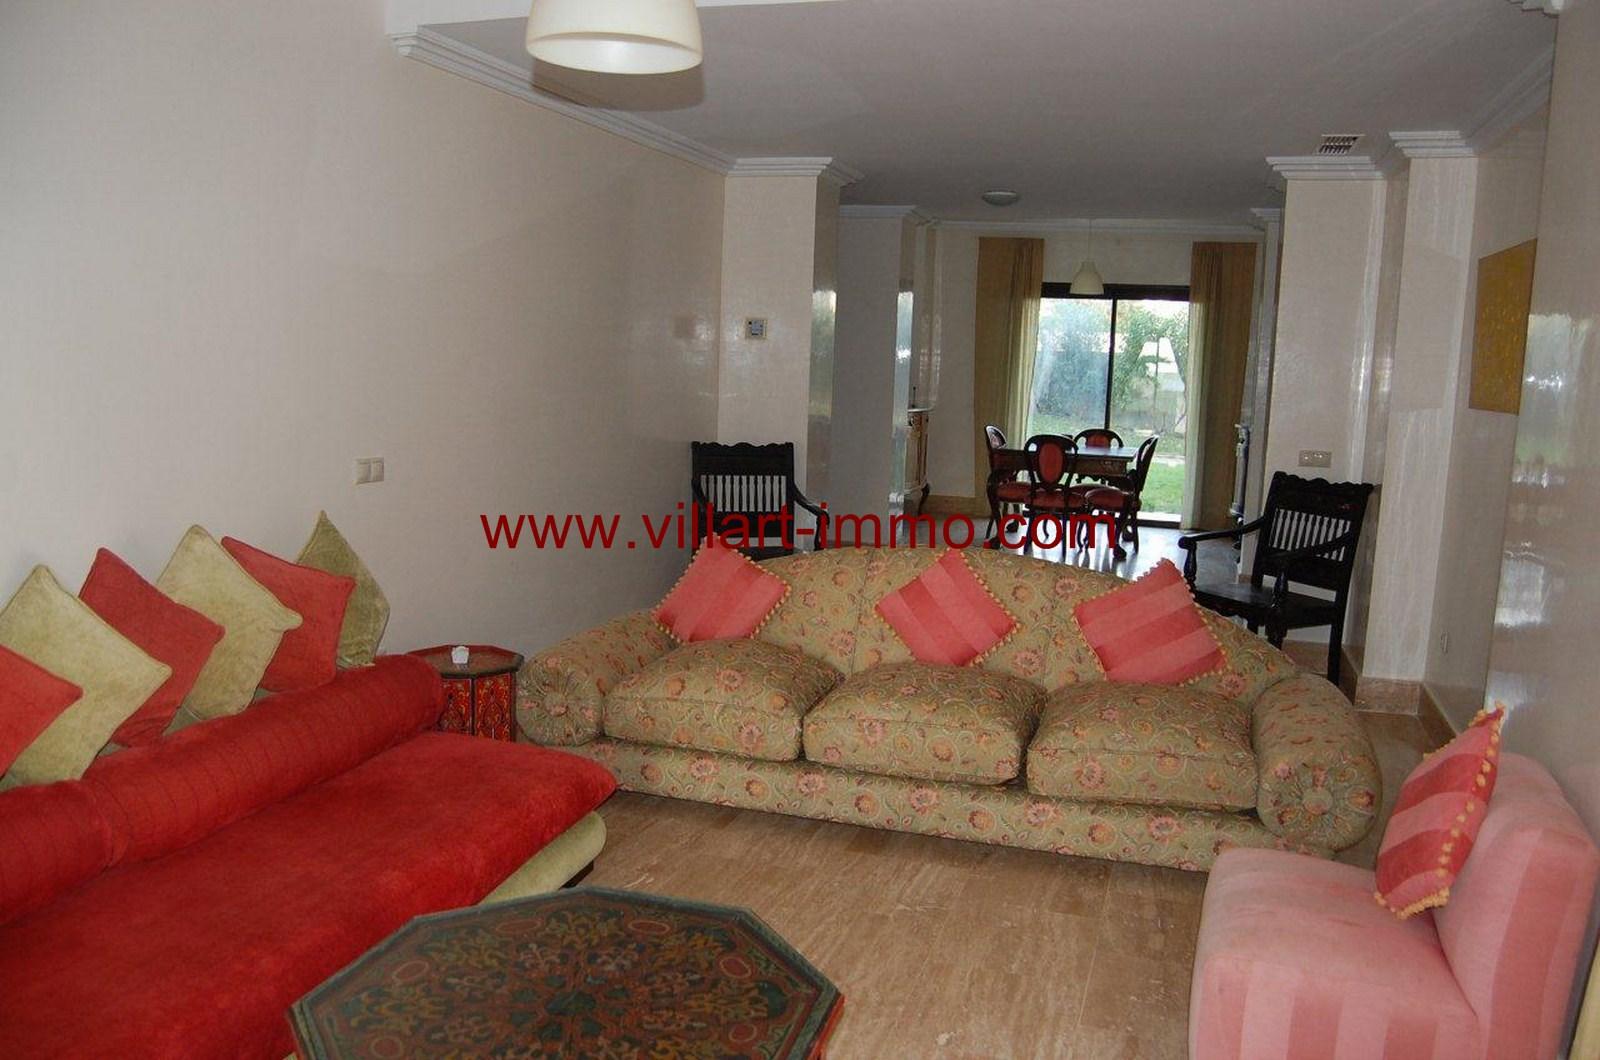 5-vente-appartement-tanger-achakar-salon-2-va390-villart-immo